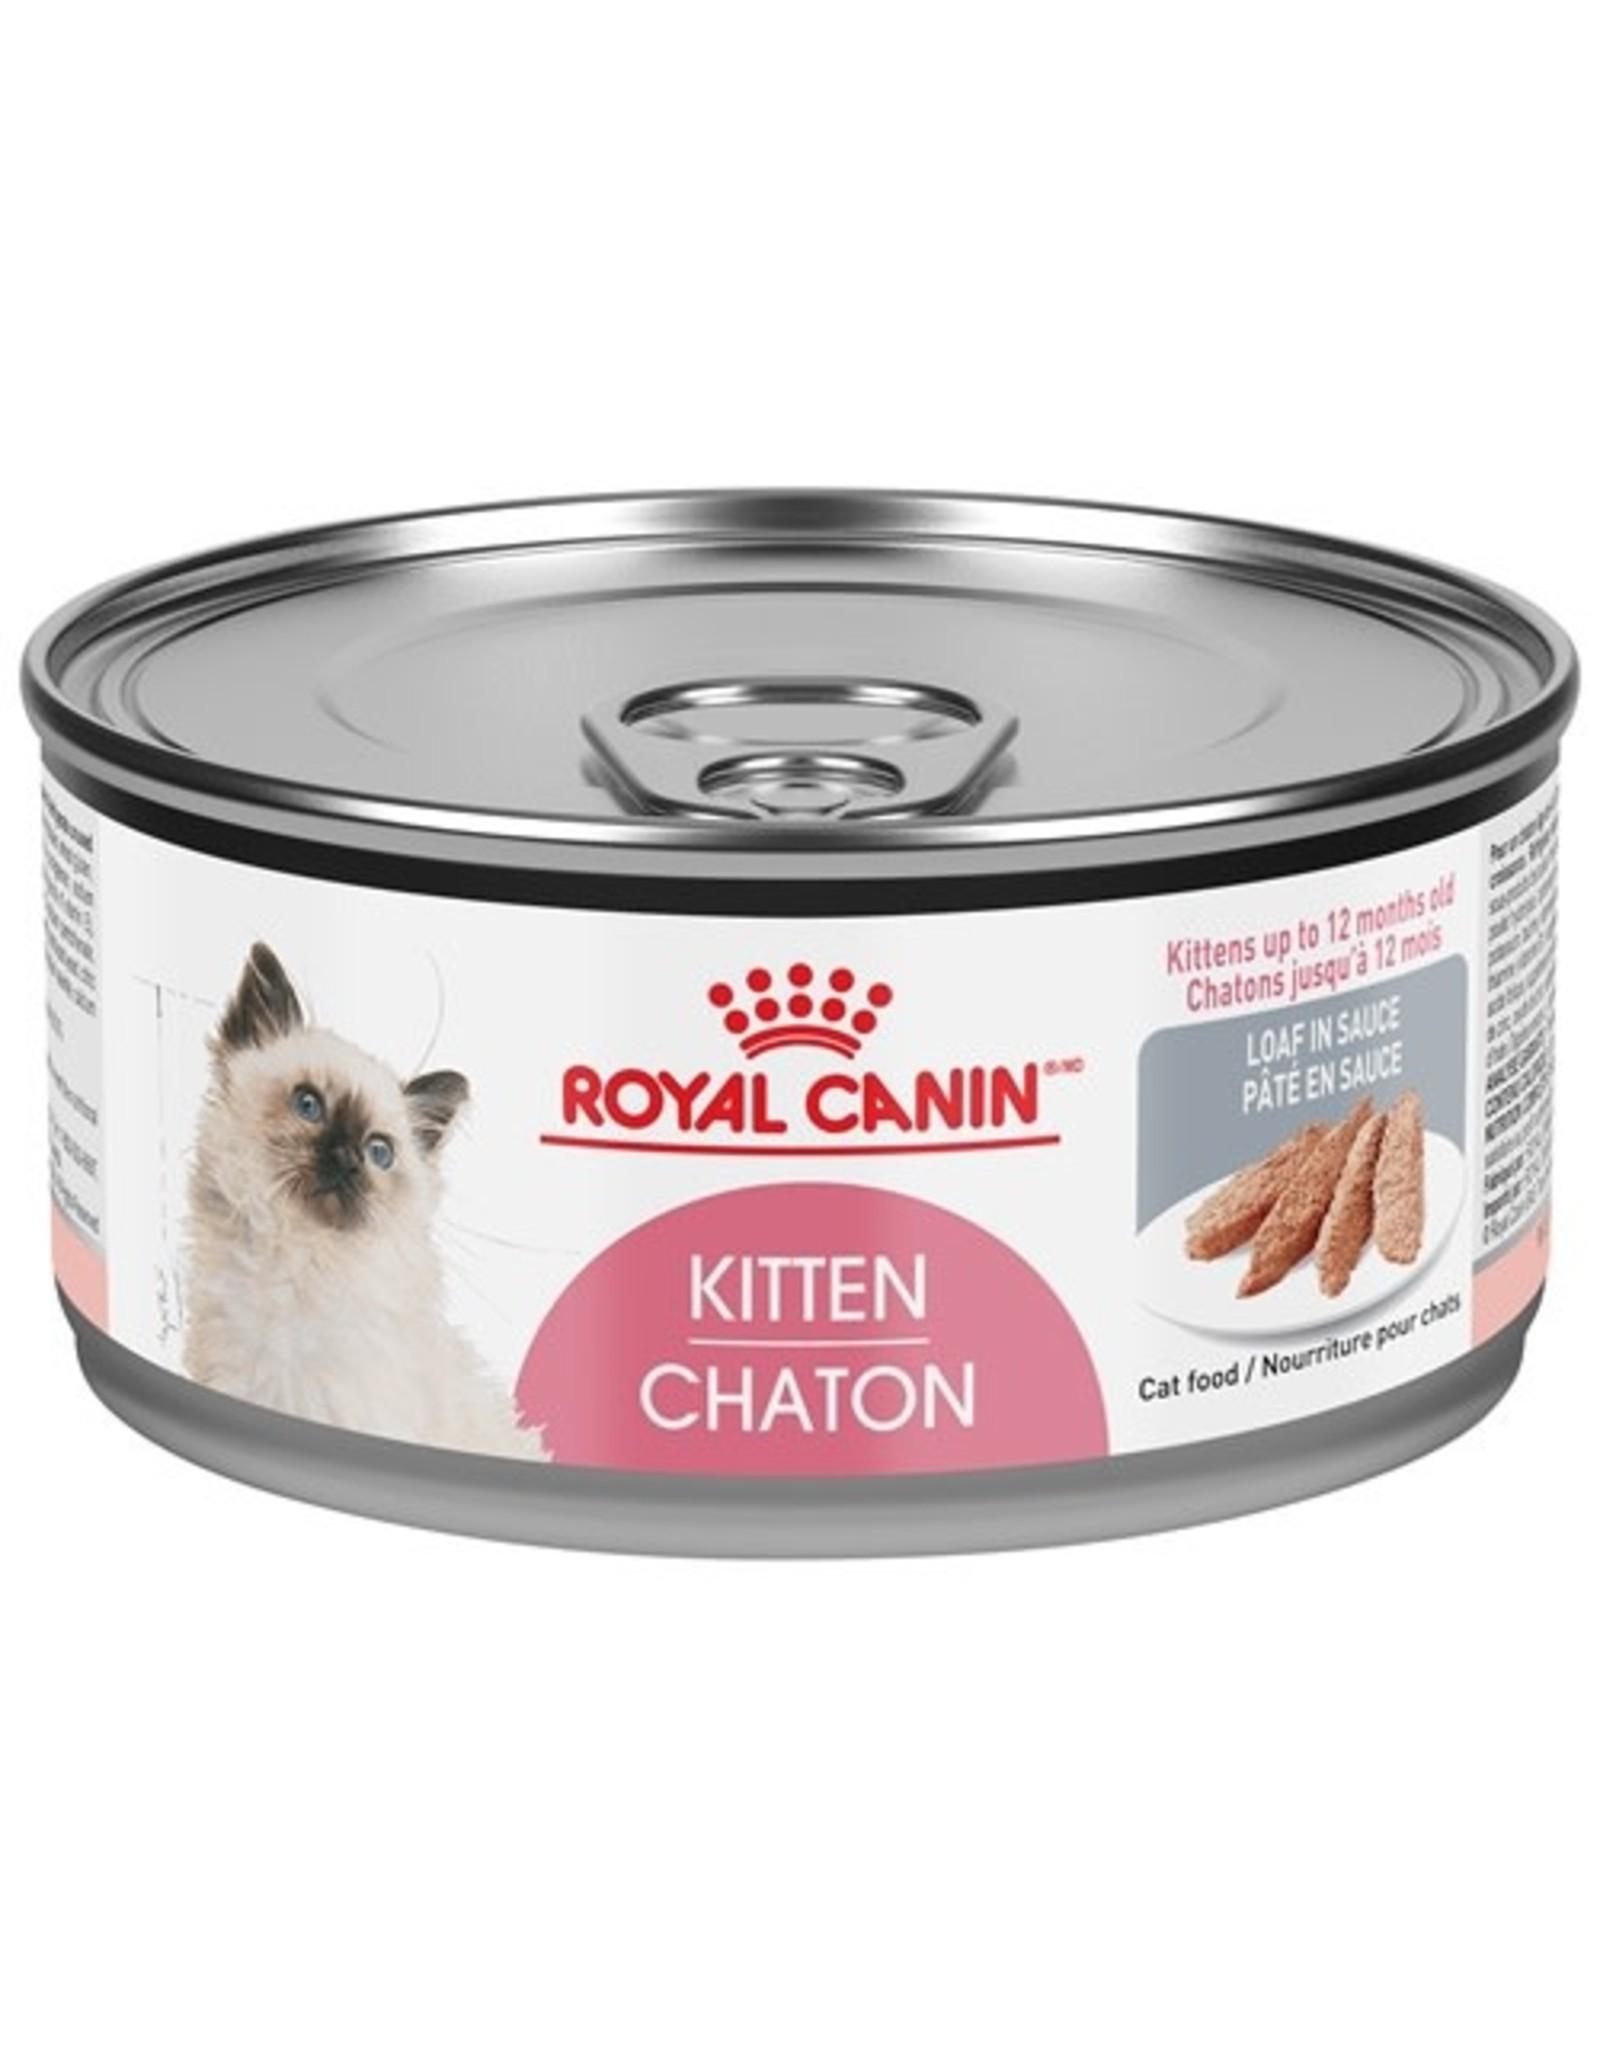 Royal Canin Royal Canin Kitten Instinctive Loaf 165g